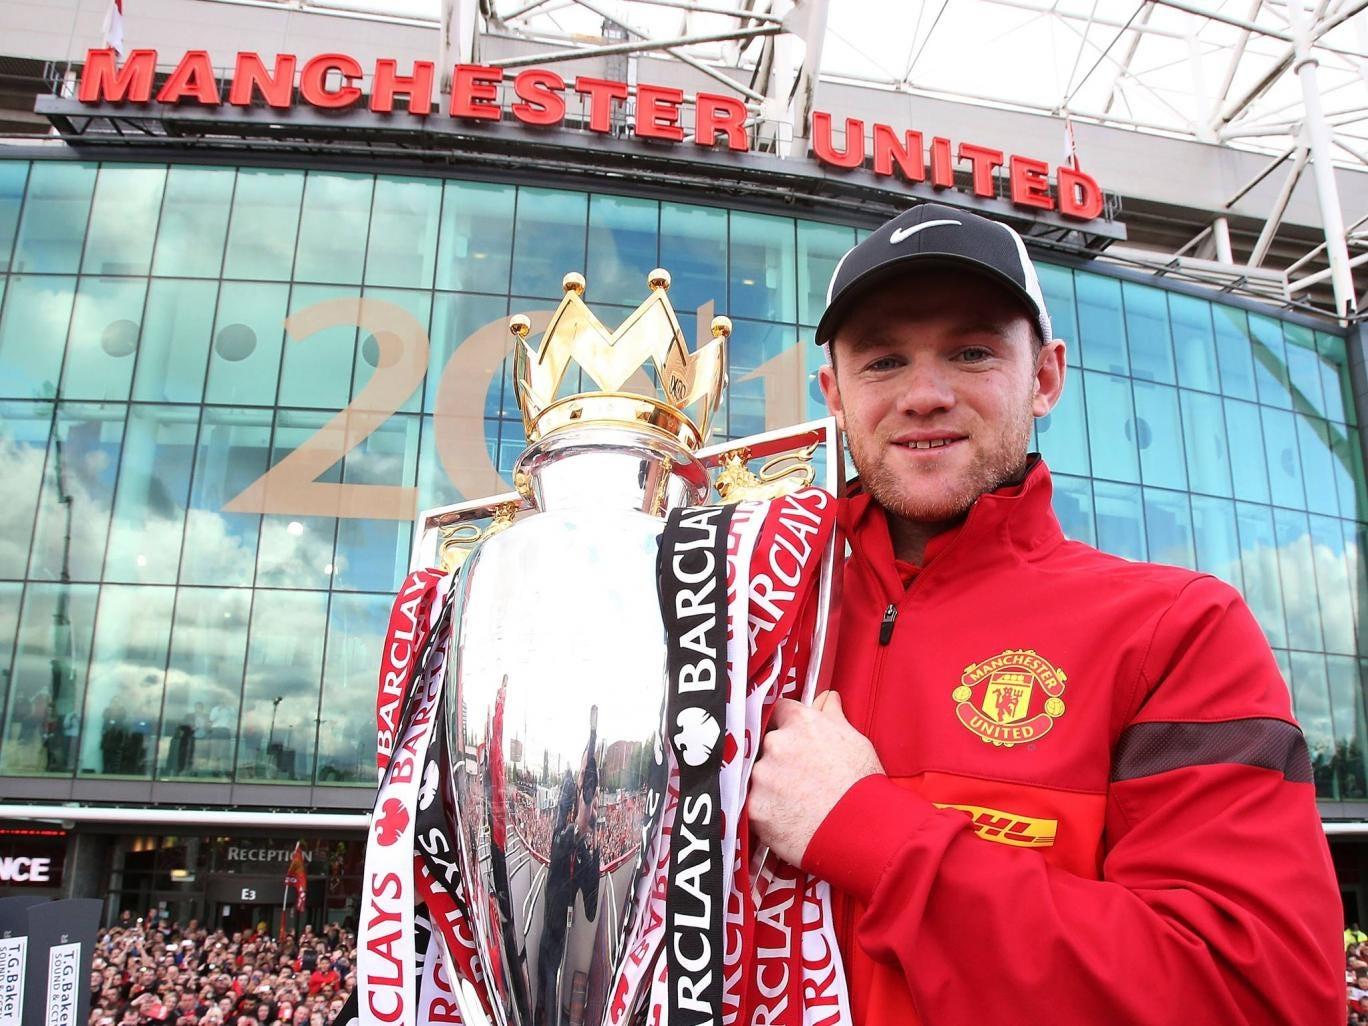 Wayne Rooney celebrates with the Premier League trophy